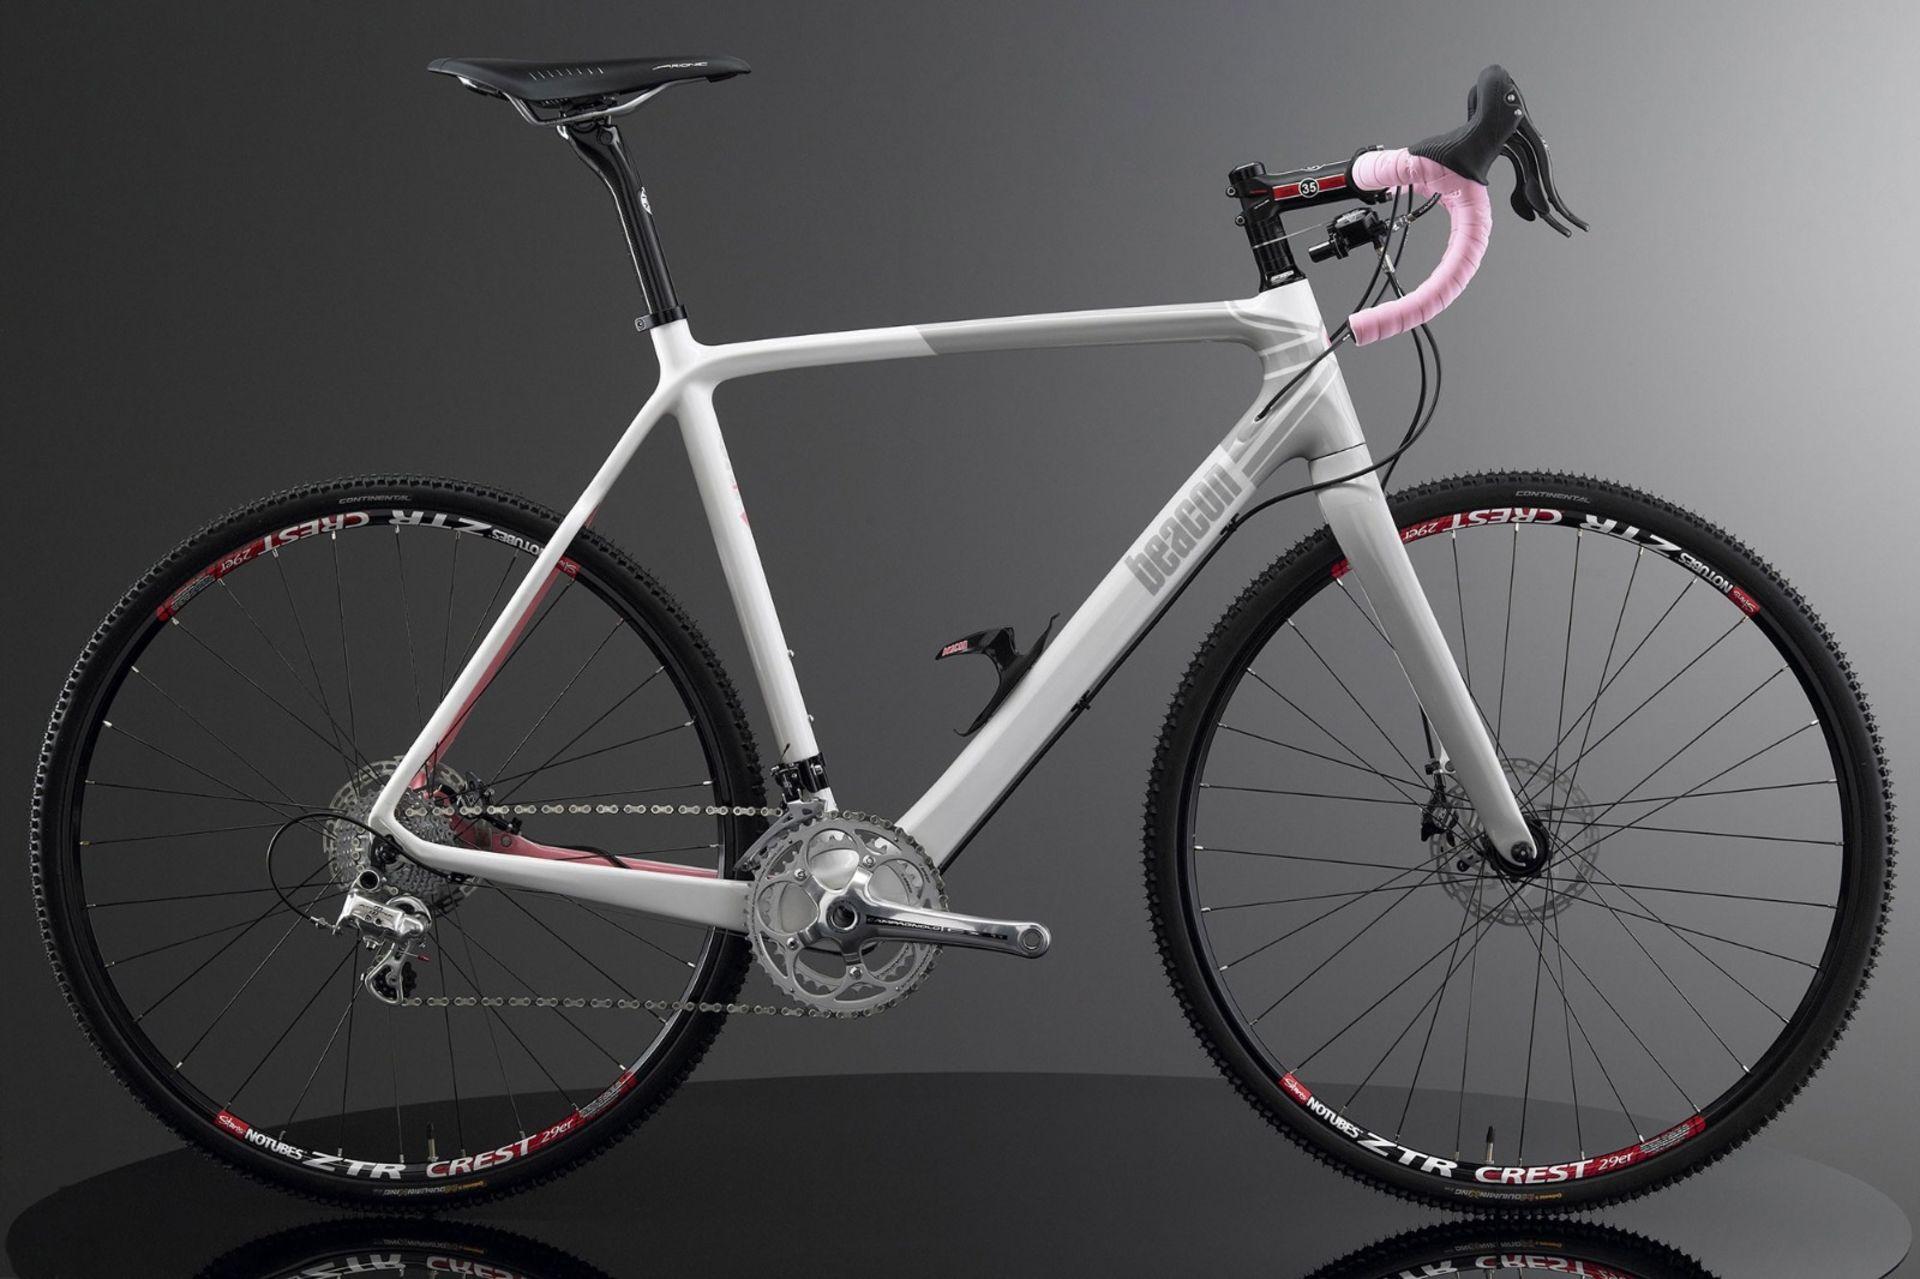 Lot 58 - 1 x Beacon Model BF-45, Size 540, Carbon Fibre Bike Frame in White & Grey.